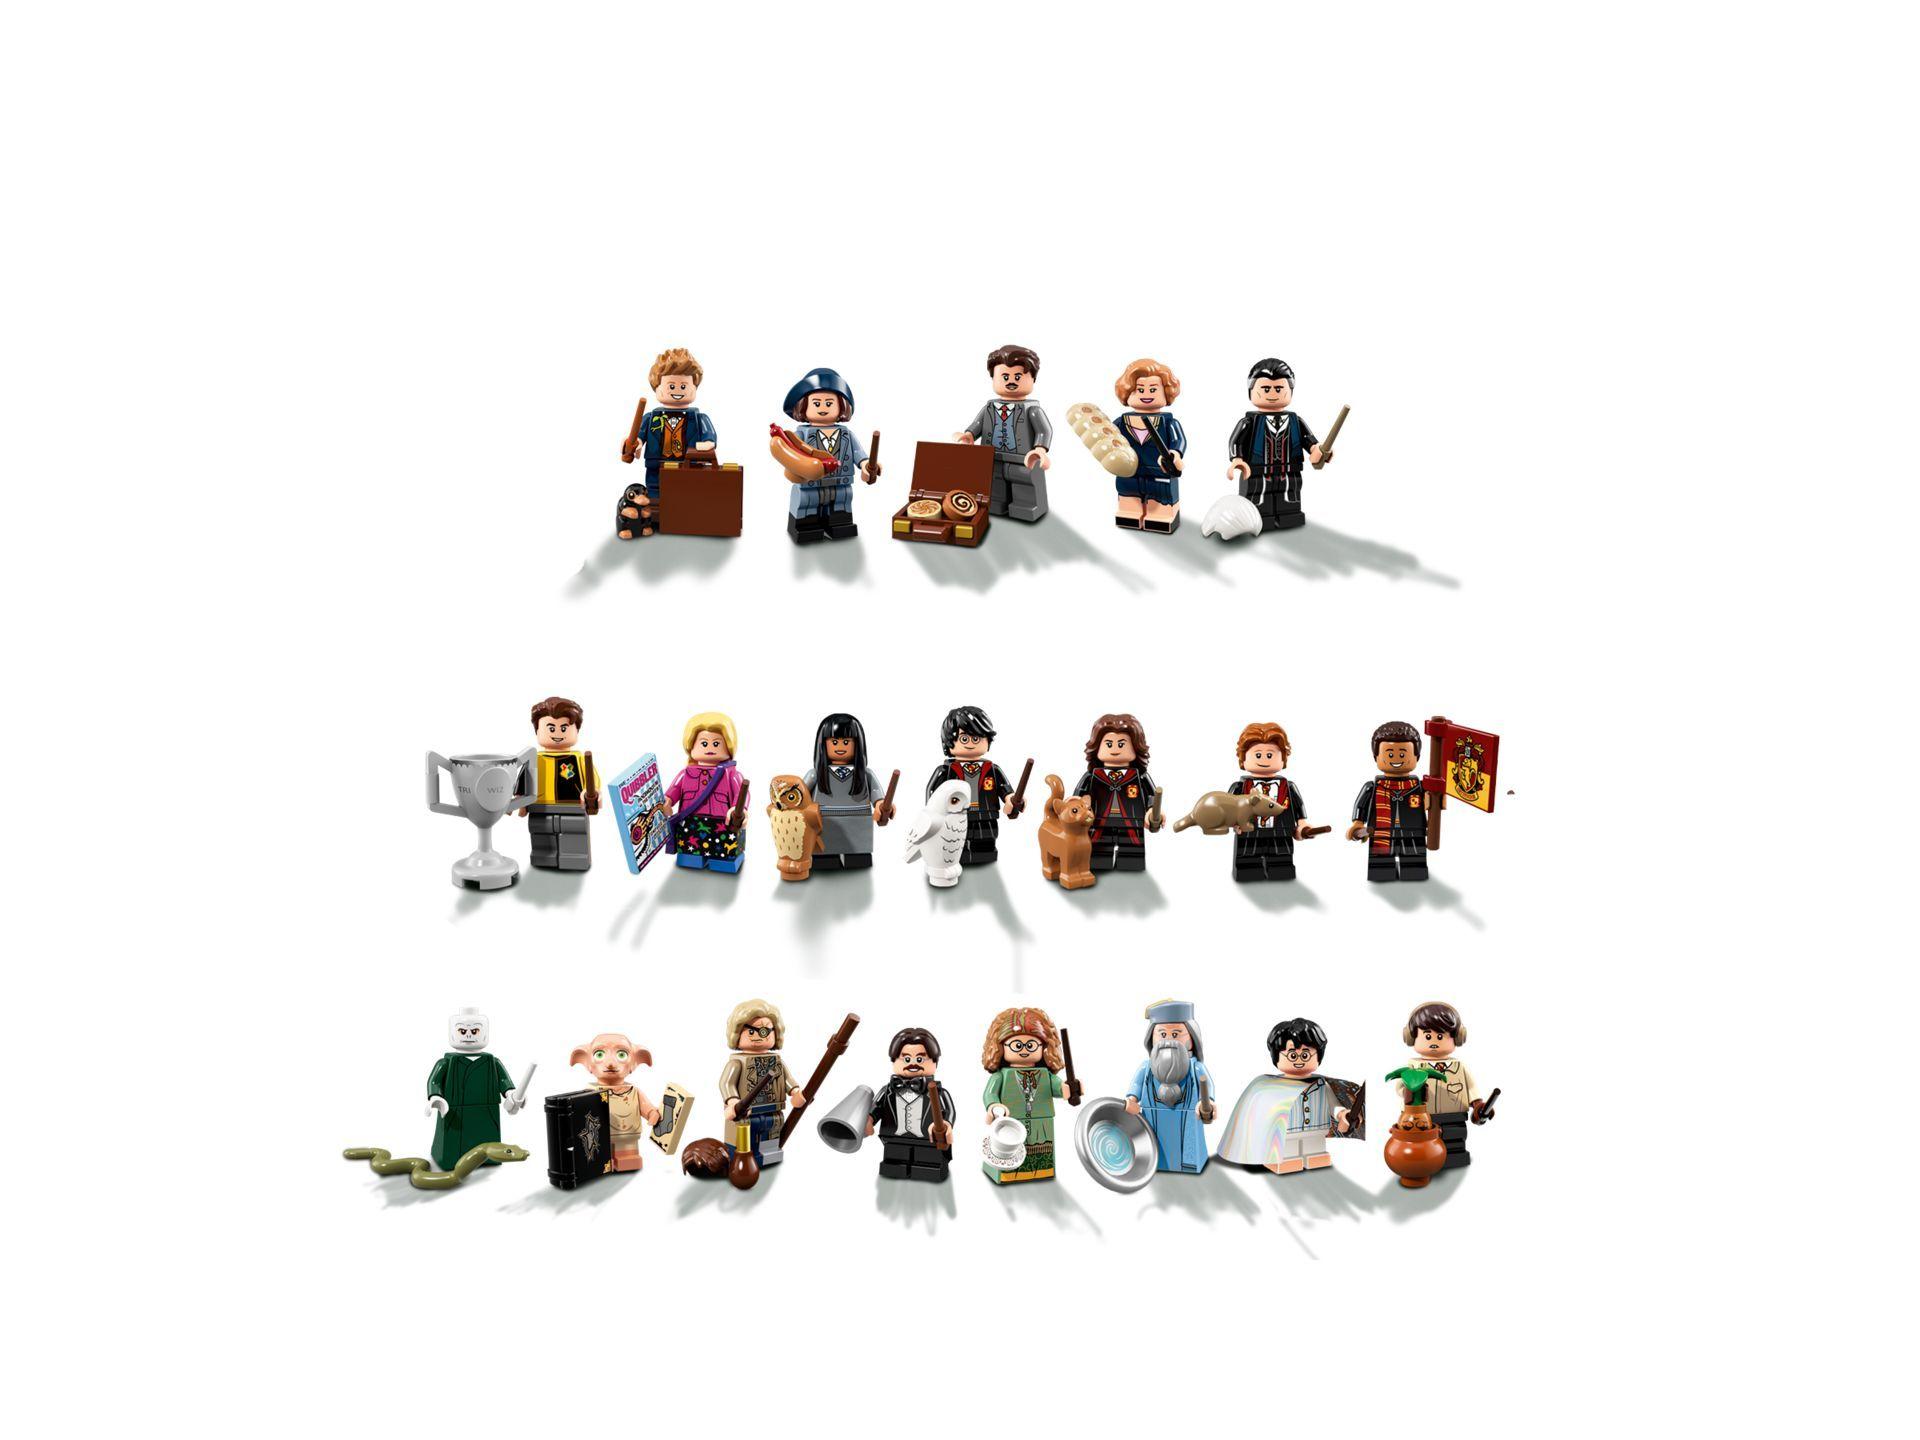 Lego® 1 x Felsen Stein Wall 4x10x6 in dunkelbeige *Neu* #6082